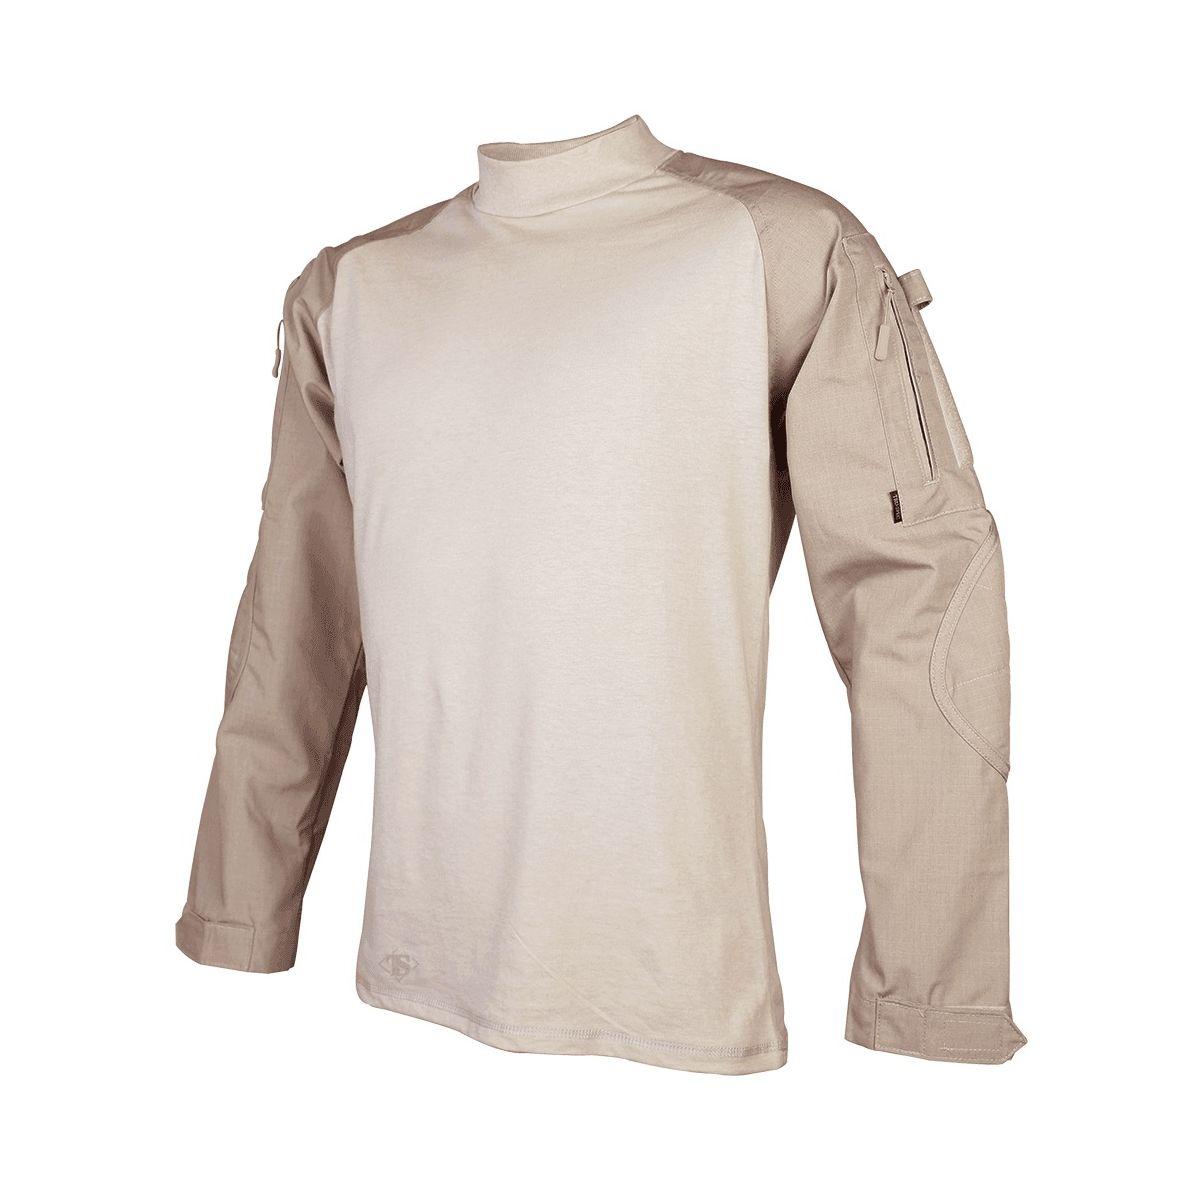 Košile taktická COMBAT rip-stop KHAKI TRU-SPEC 25540 L-11